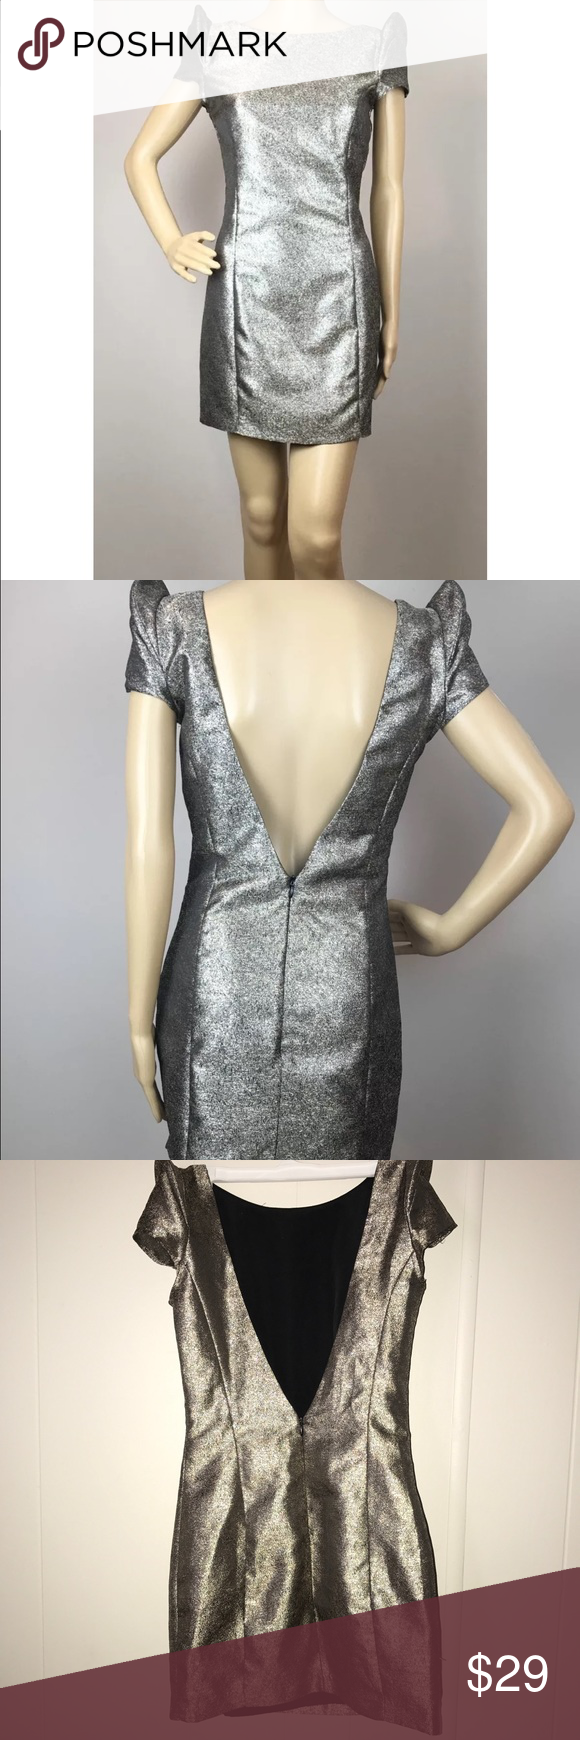 5/48 SAKS 5th Ave Metallic Sheath Dress Low Back